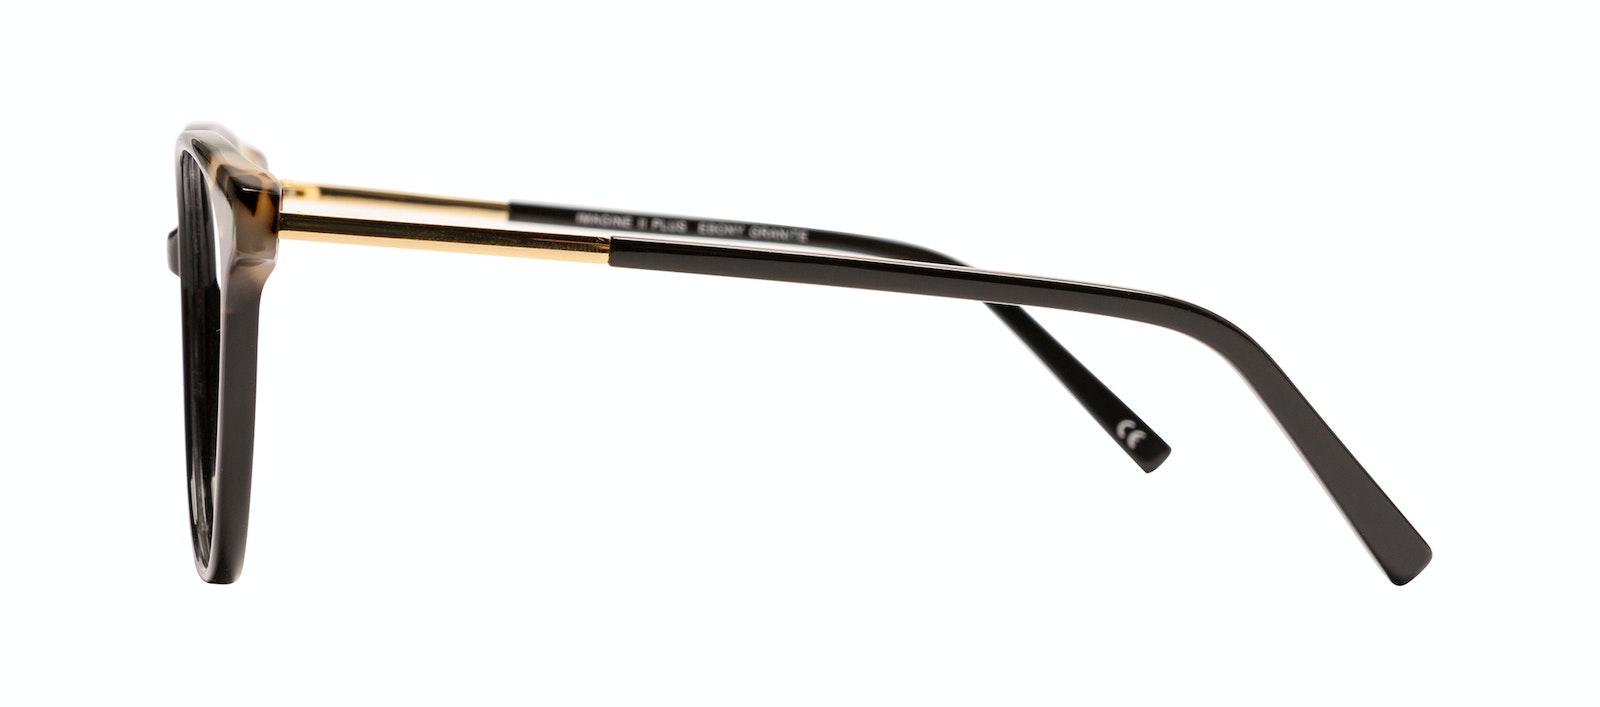 Affordable Fashion Glasses Cat Eye Eyeglasses Women Imagine II Plus Ebony Granite Side